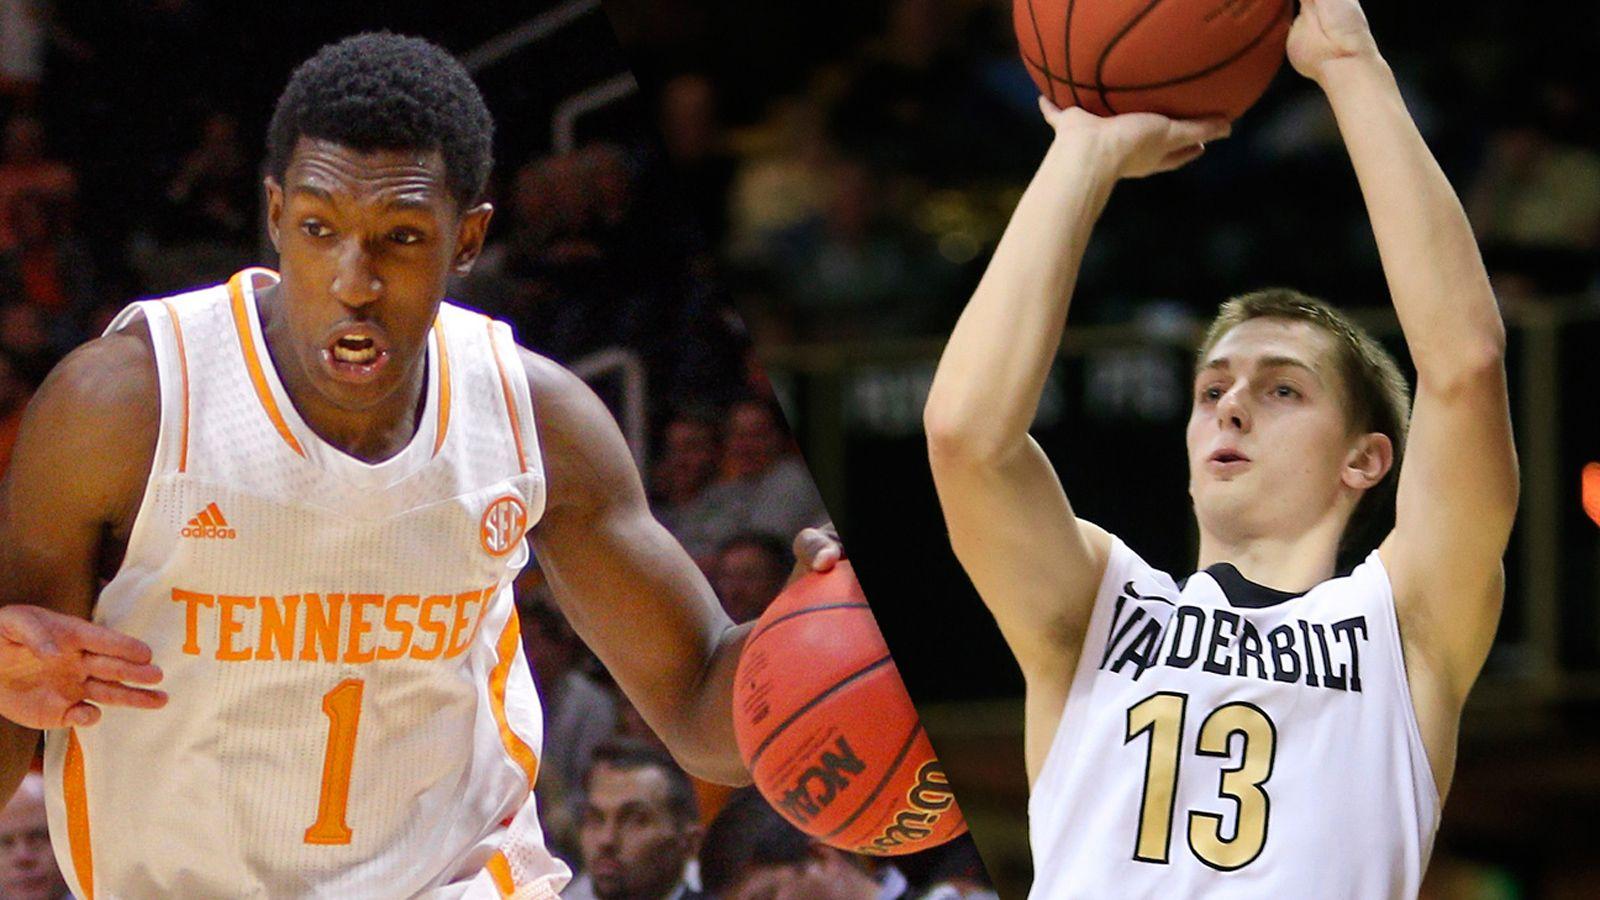 Tennessee's Josh Richardson and Vanderbilt's LaChance earn weekly SEC basketball honors